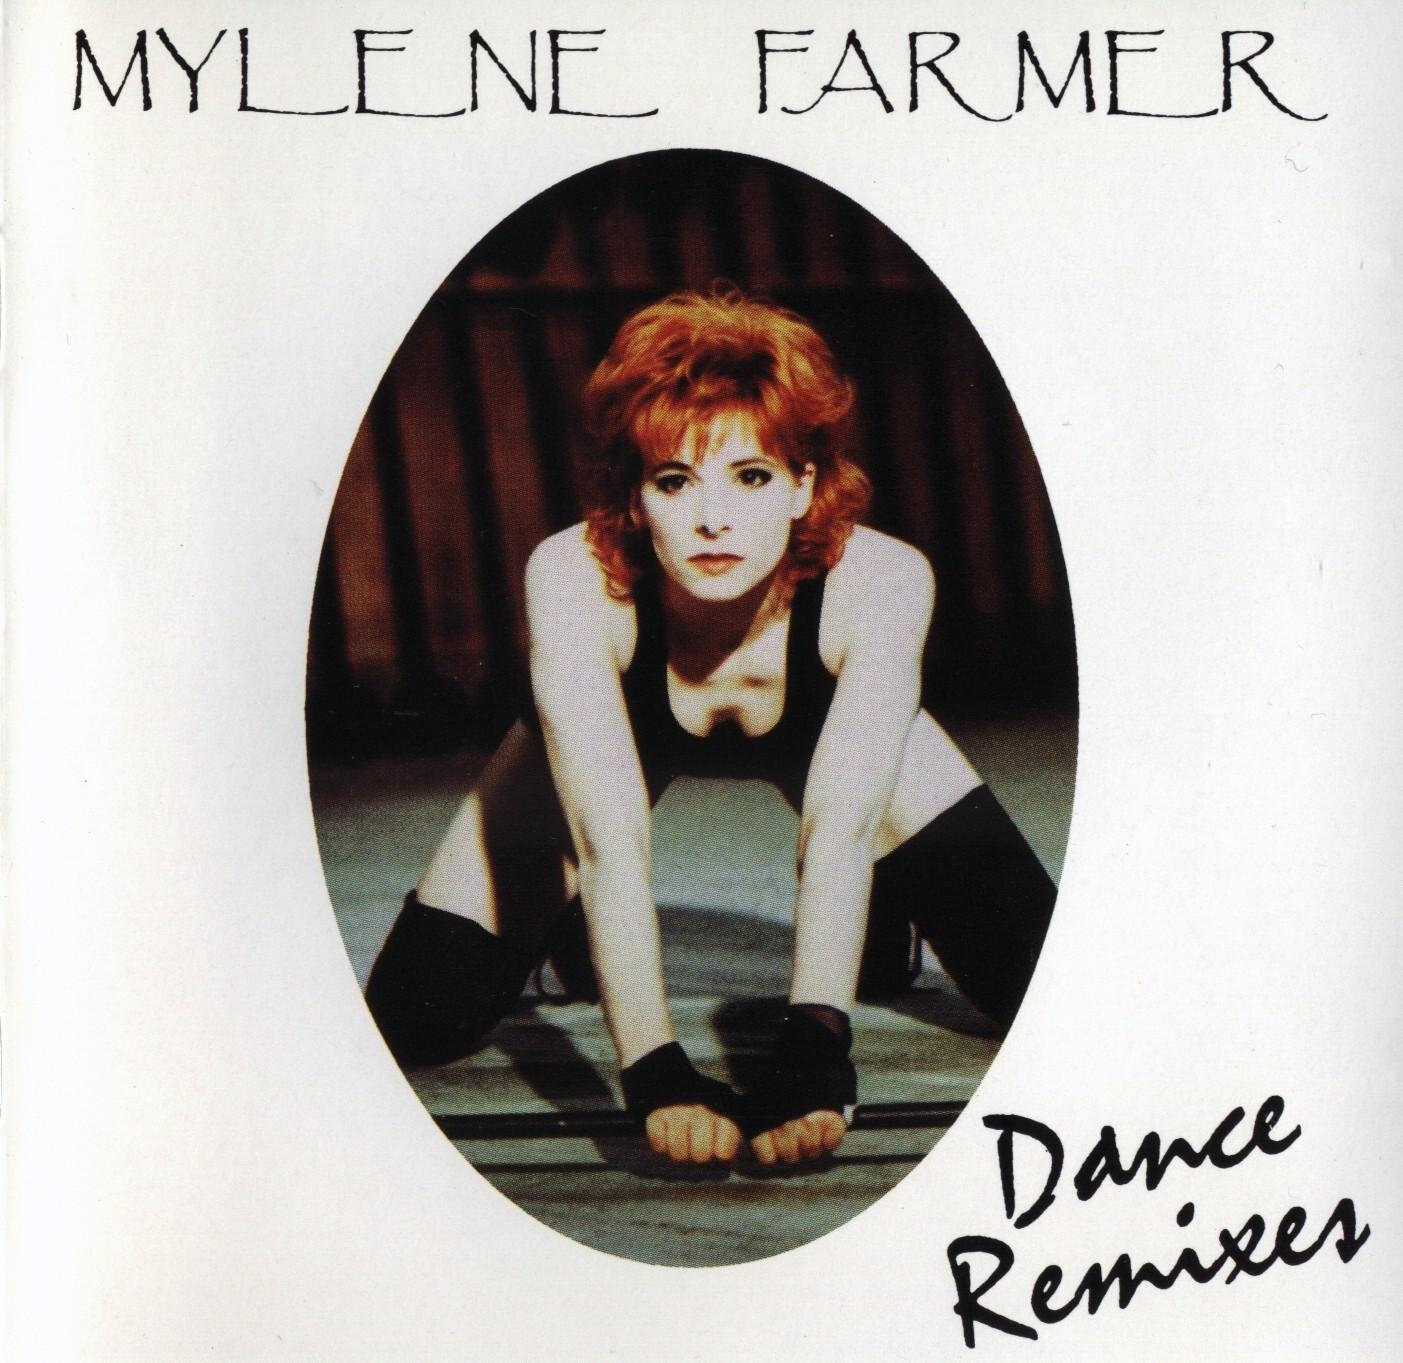 http://3.bp.blogspot.com/_swO1O7nE7JY/S8nmRxosnSI/AAAAAAAABdM/ECjPhPl-Oxw/s1600/mylene+farmer+-+dance+remixes+(cd+2).jpg